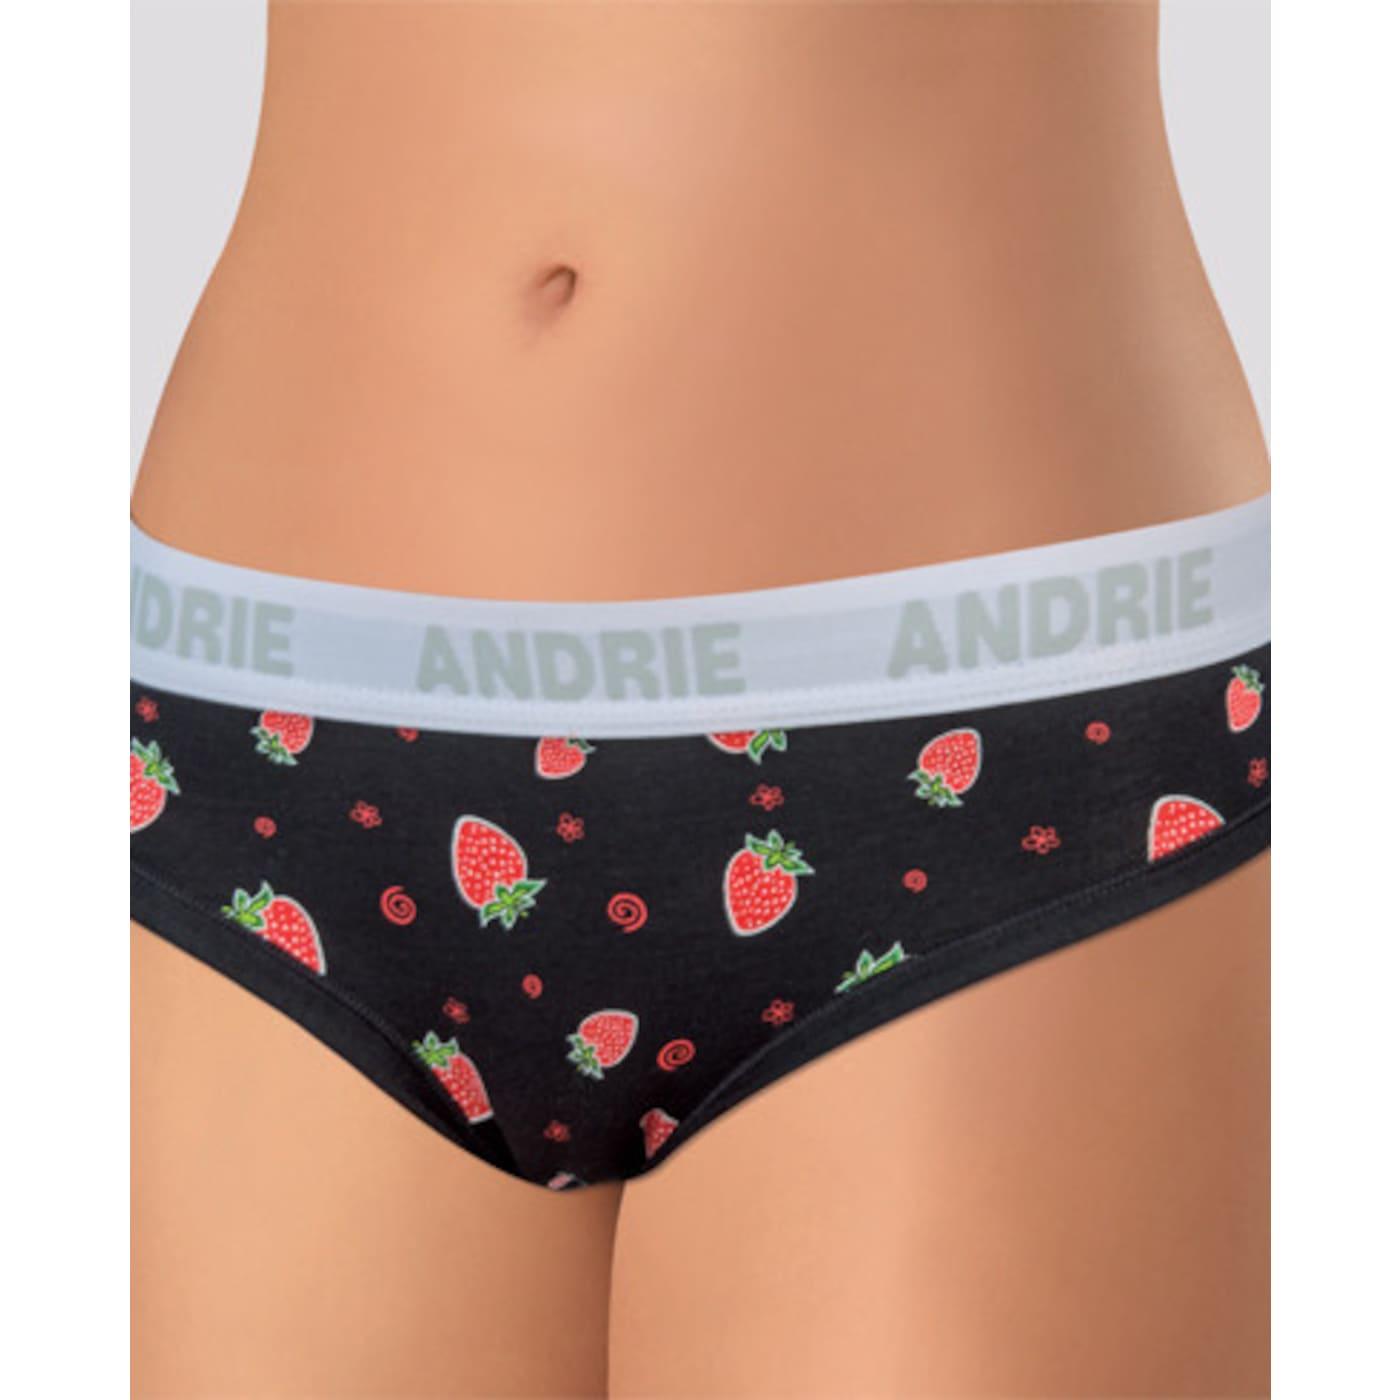 Women's panties Andrie black  dámské Neurčeno M